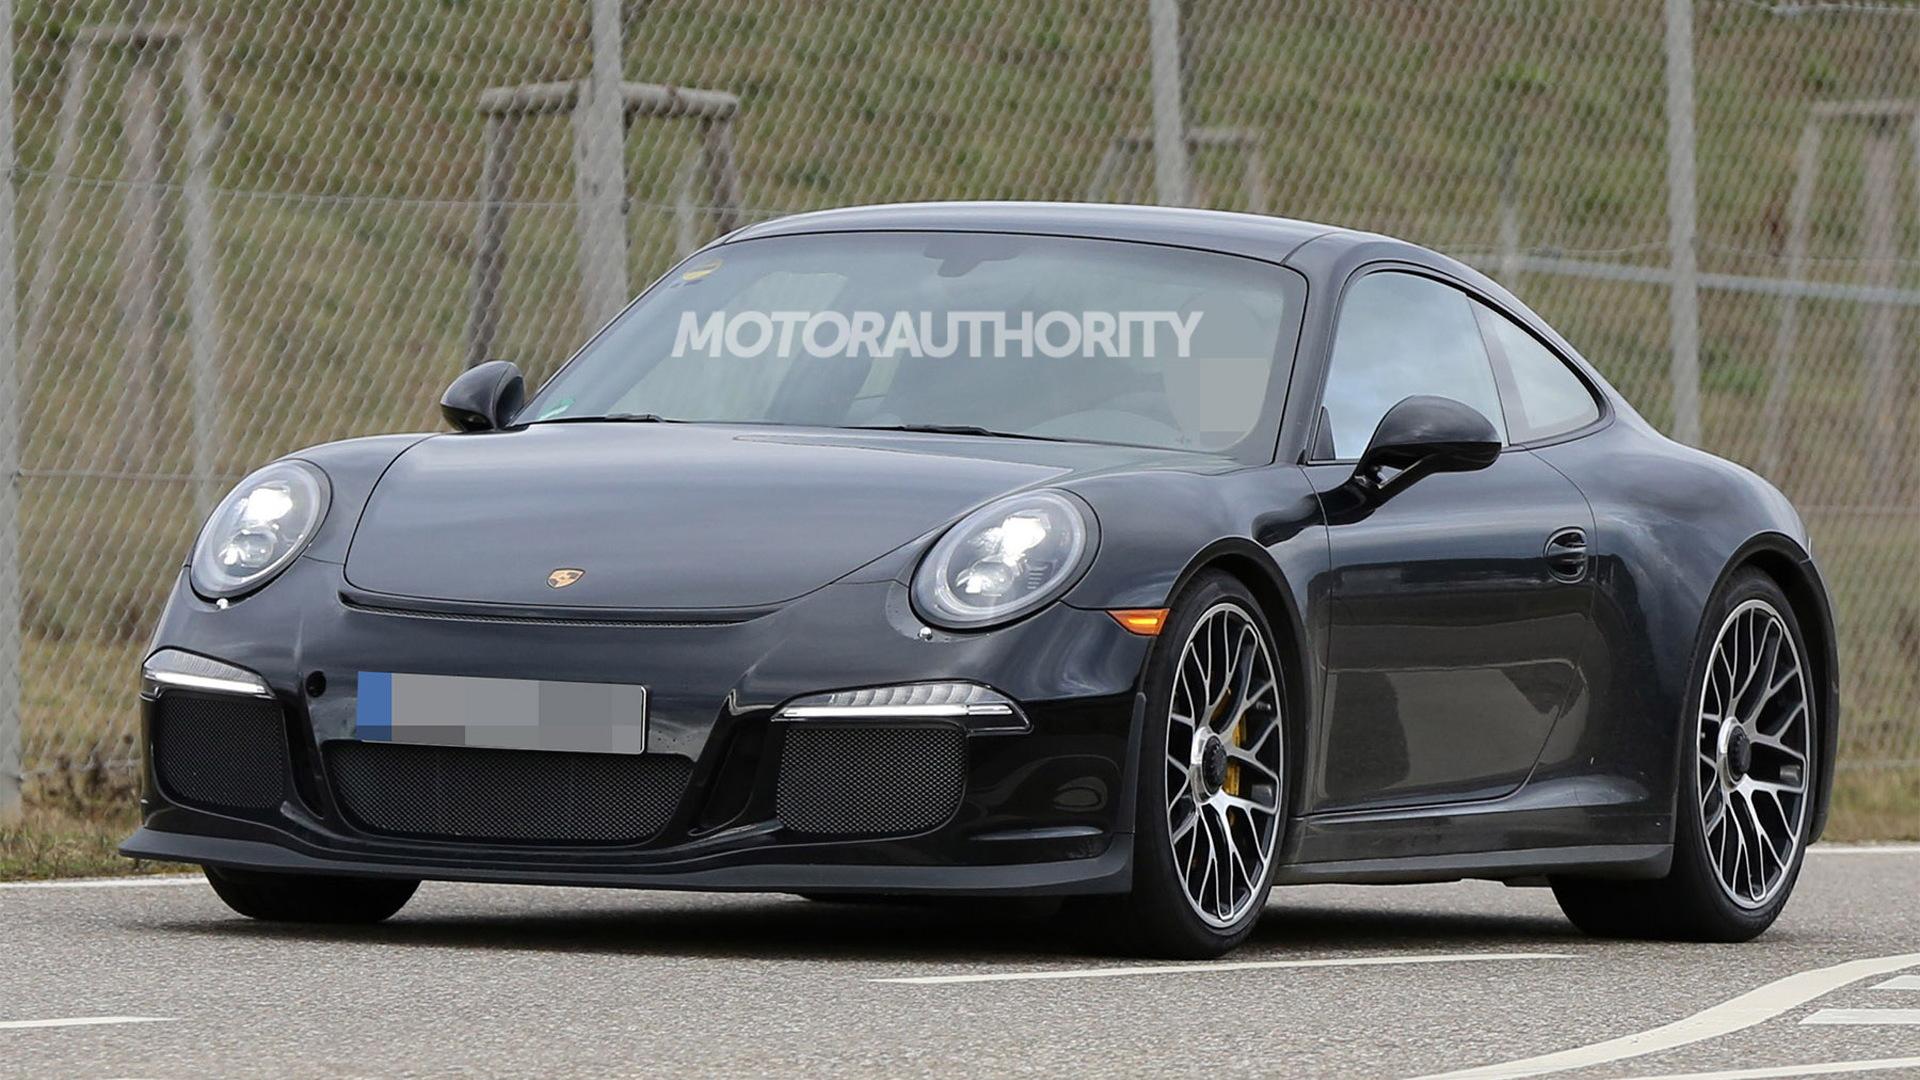 2017 Porsche 911 R spy shots - Image via S. Baldauf/SB-Medien